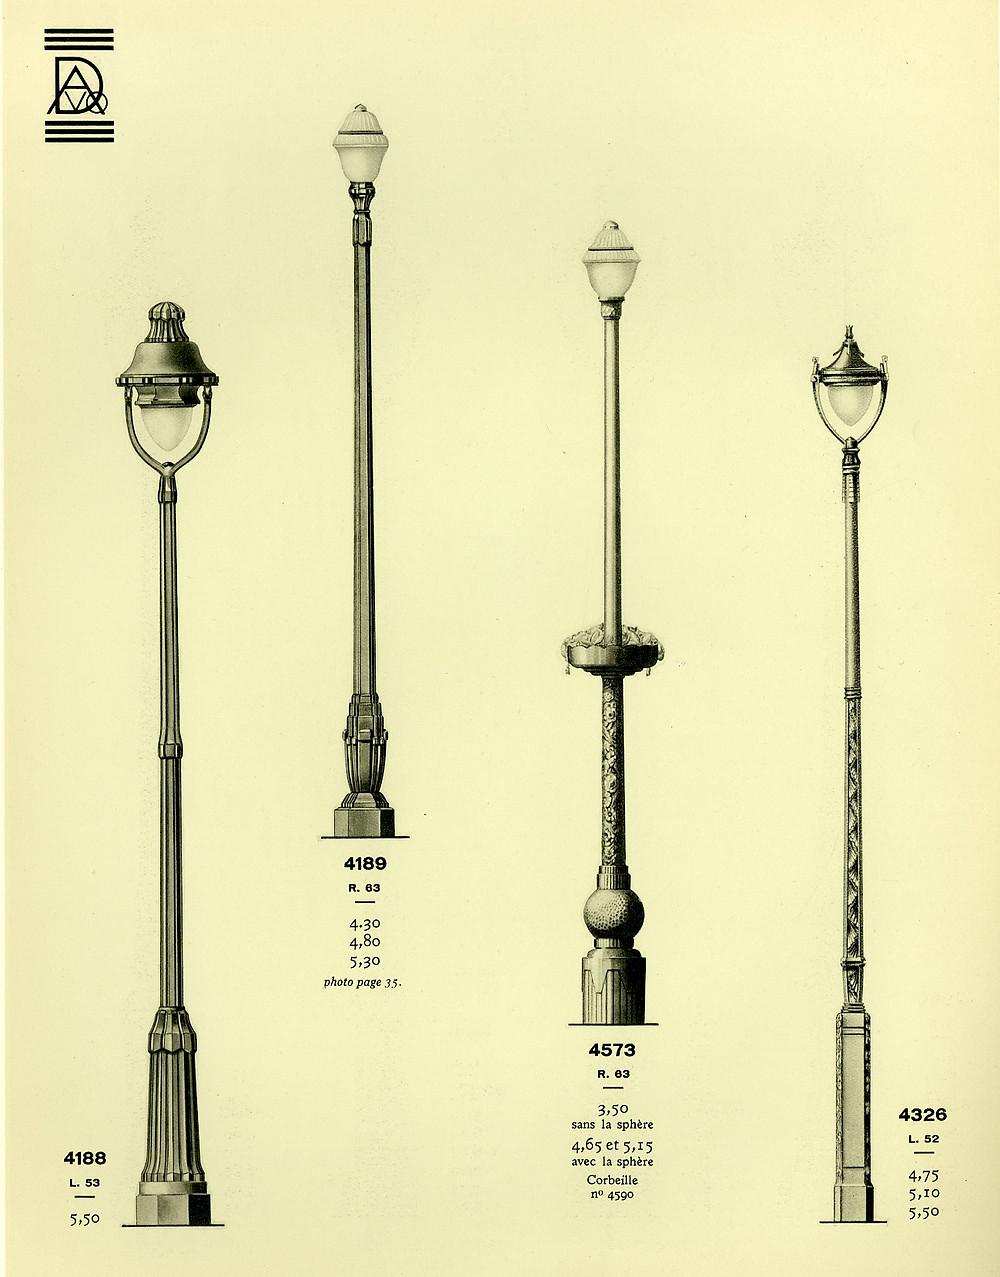 catalog of lampposts